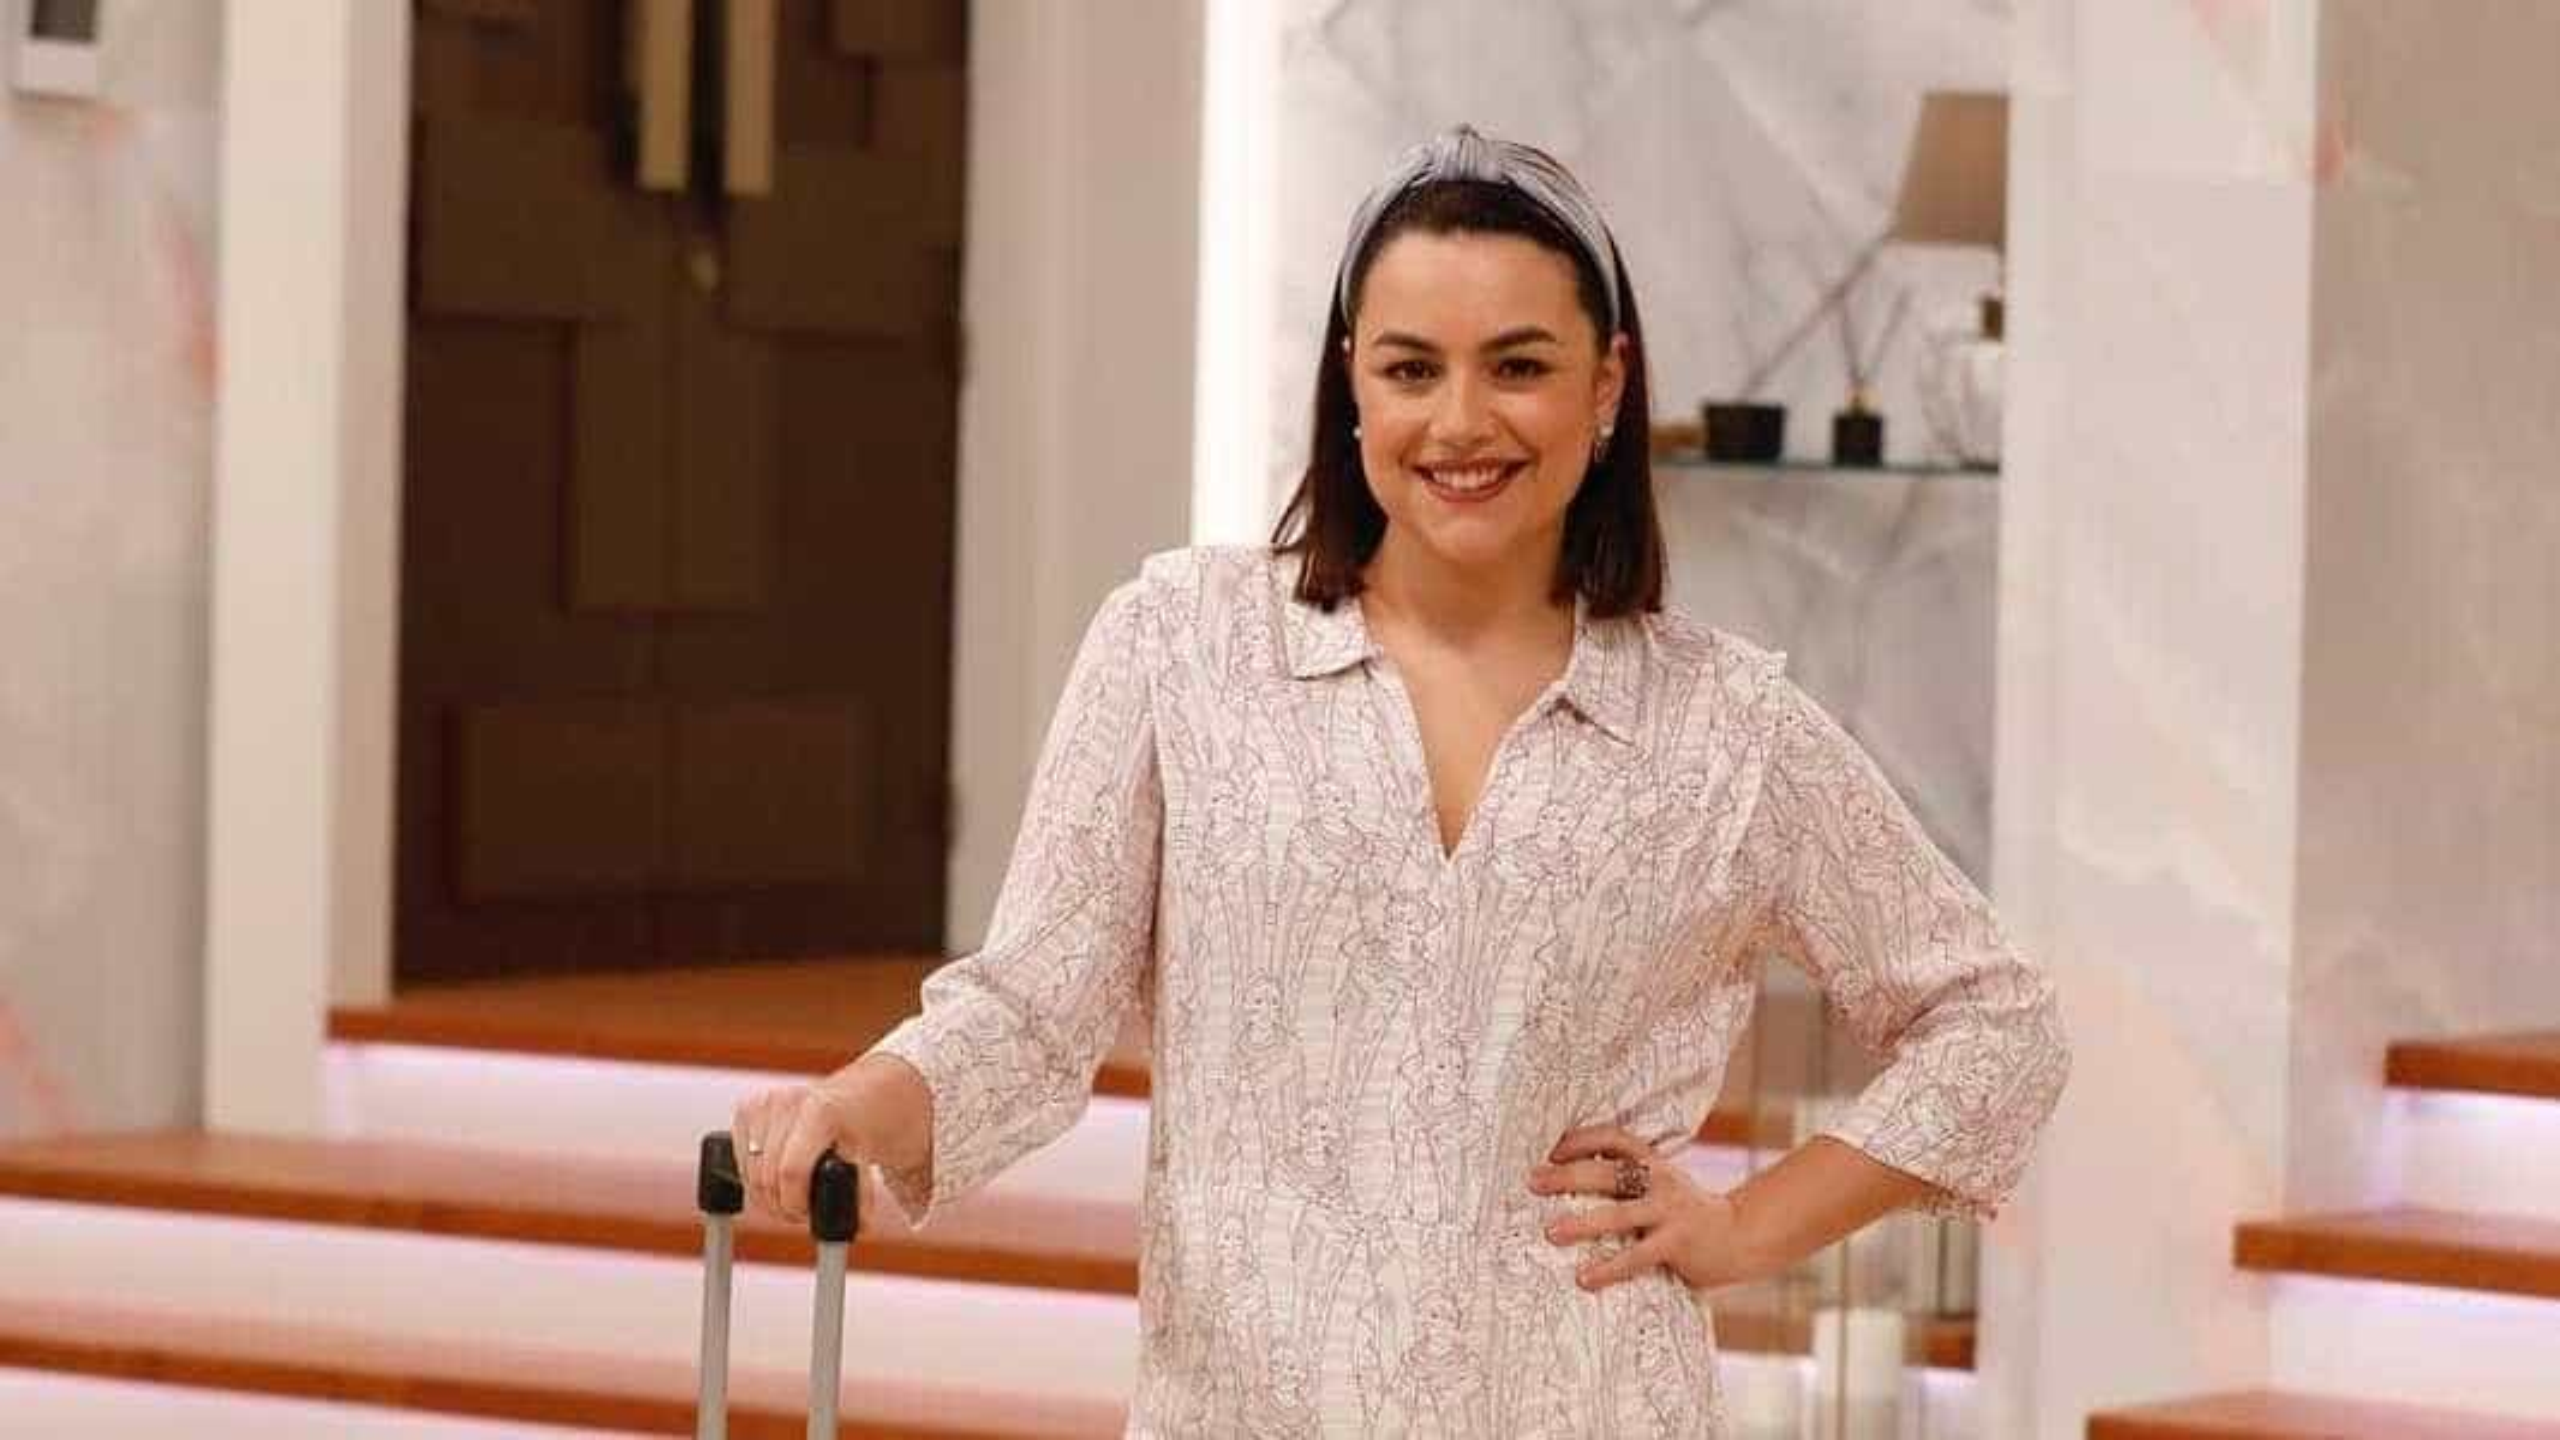 Ana Guiomar diz 'sim' a desafio proposto por Cristina Ferreira